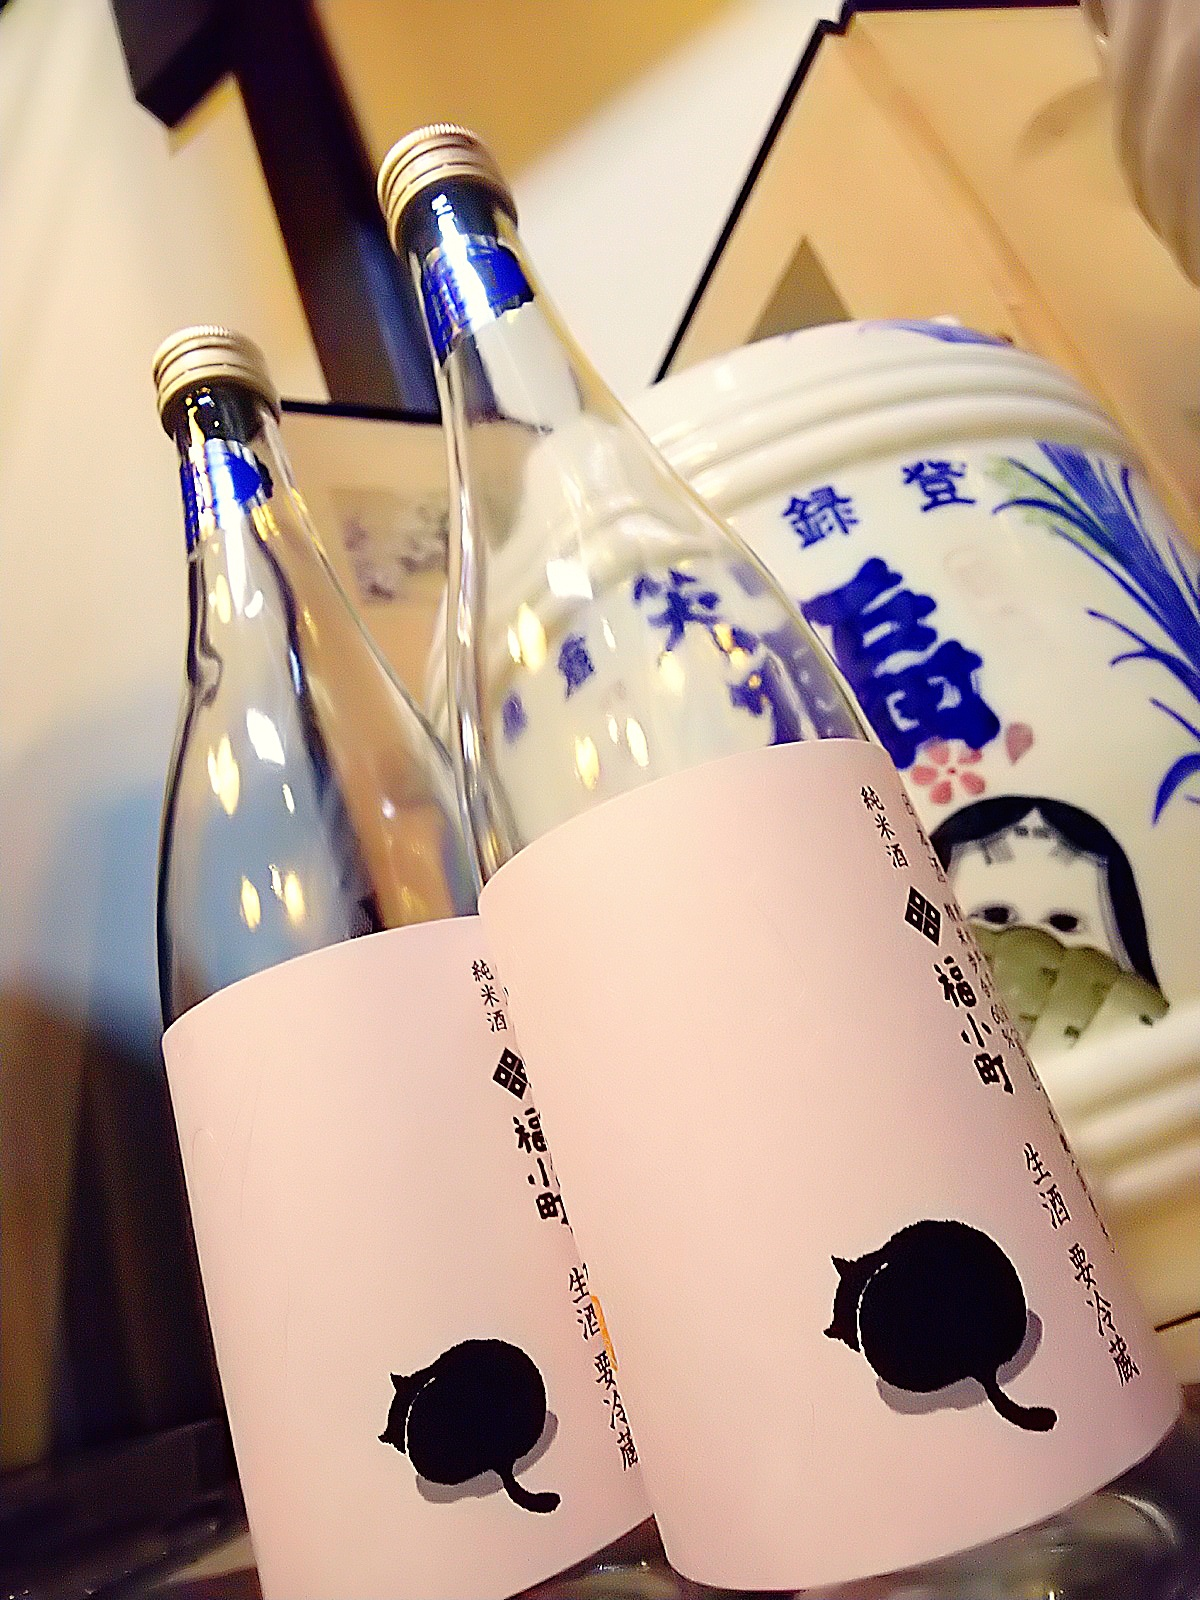 http://www.fukukomachi.com/blog/photo/C360_2019-04-16-08-29-22-330.jpg